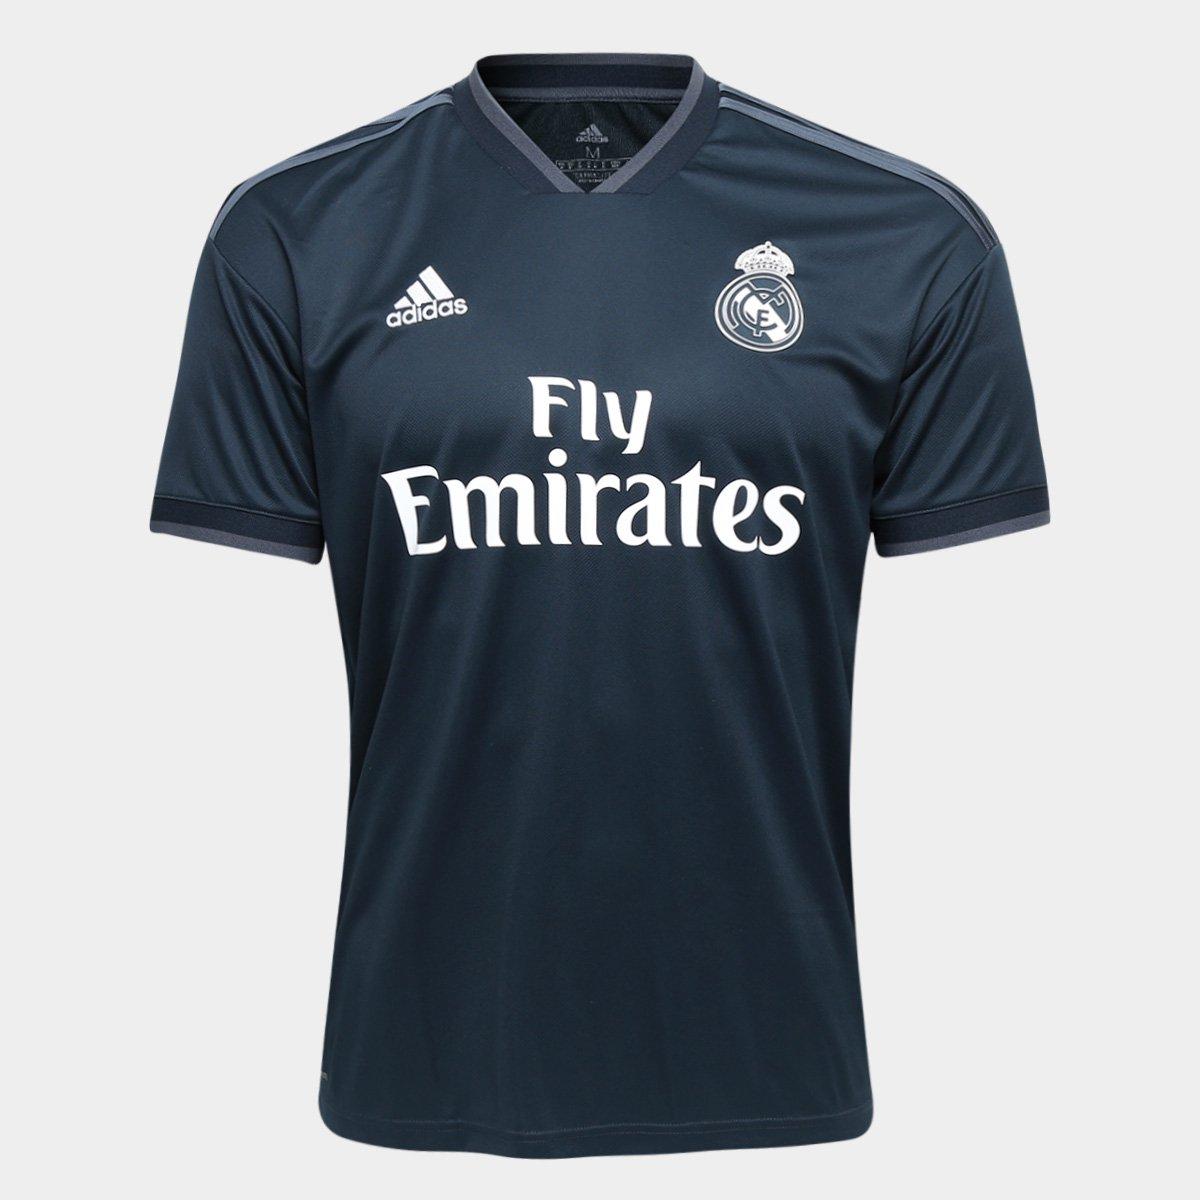 29cae853b Camisa Real Madrid Away 2018 s n° Torcedor Adidas Masculina - Azul Escuro -  Compre Agora